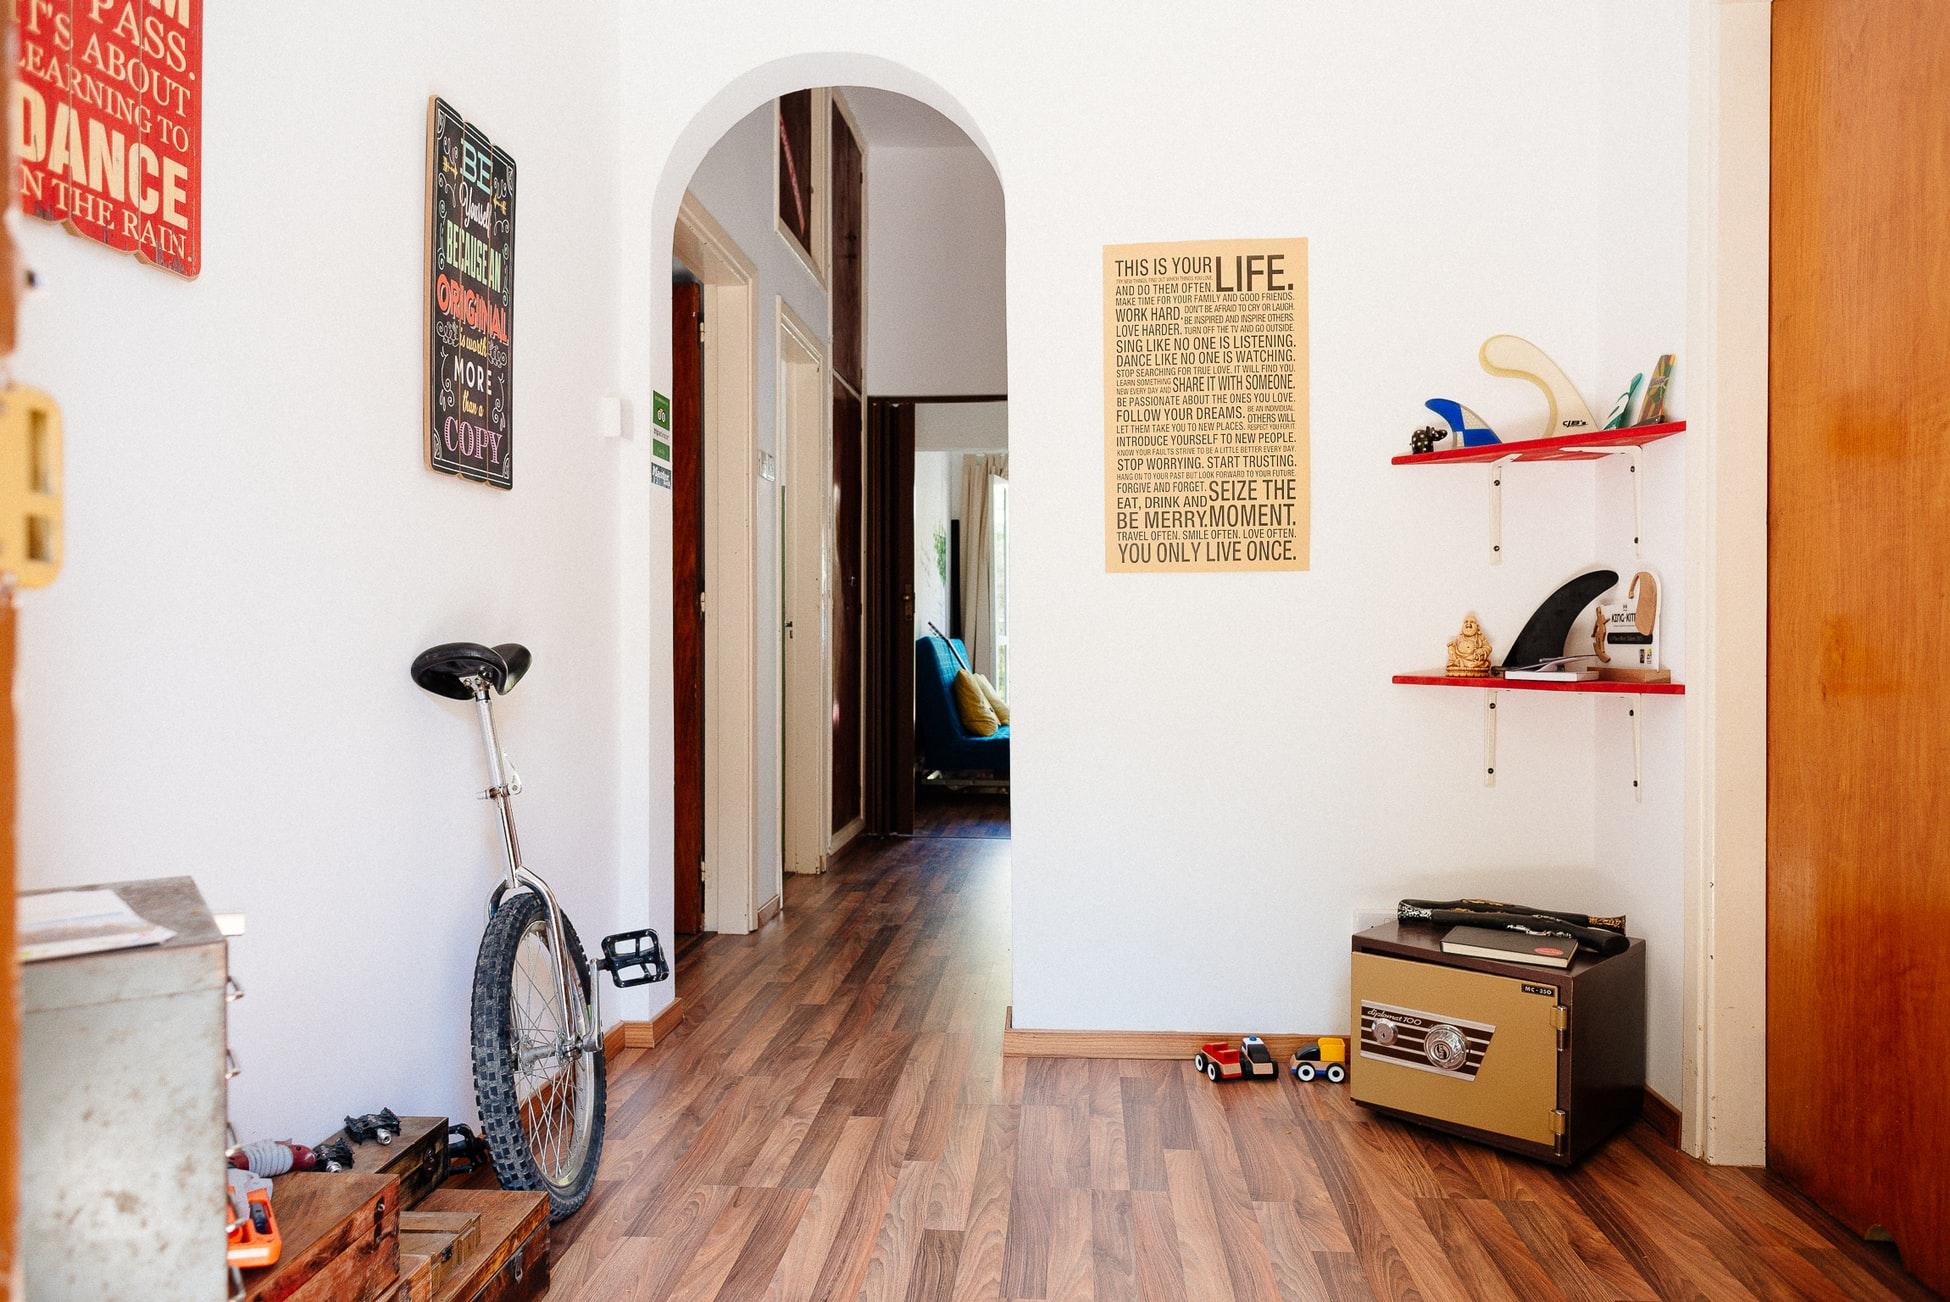 Do hardwood floors make your house colder